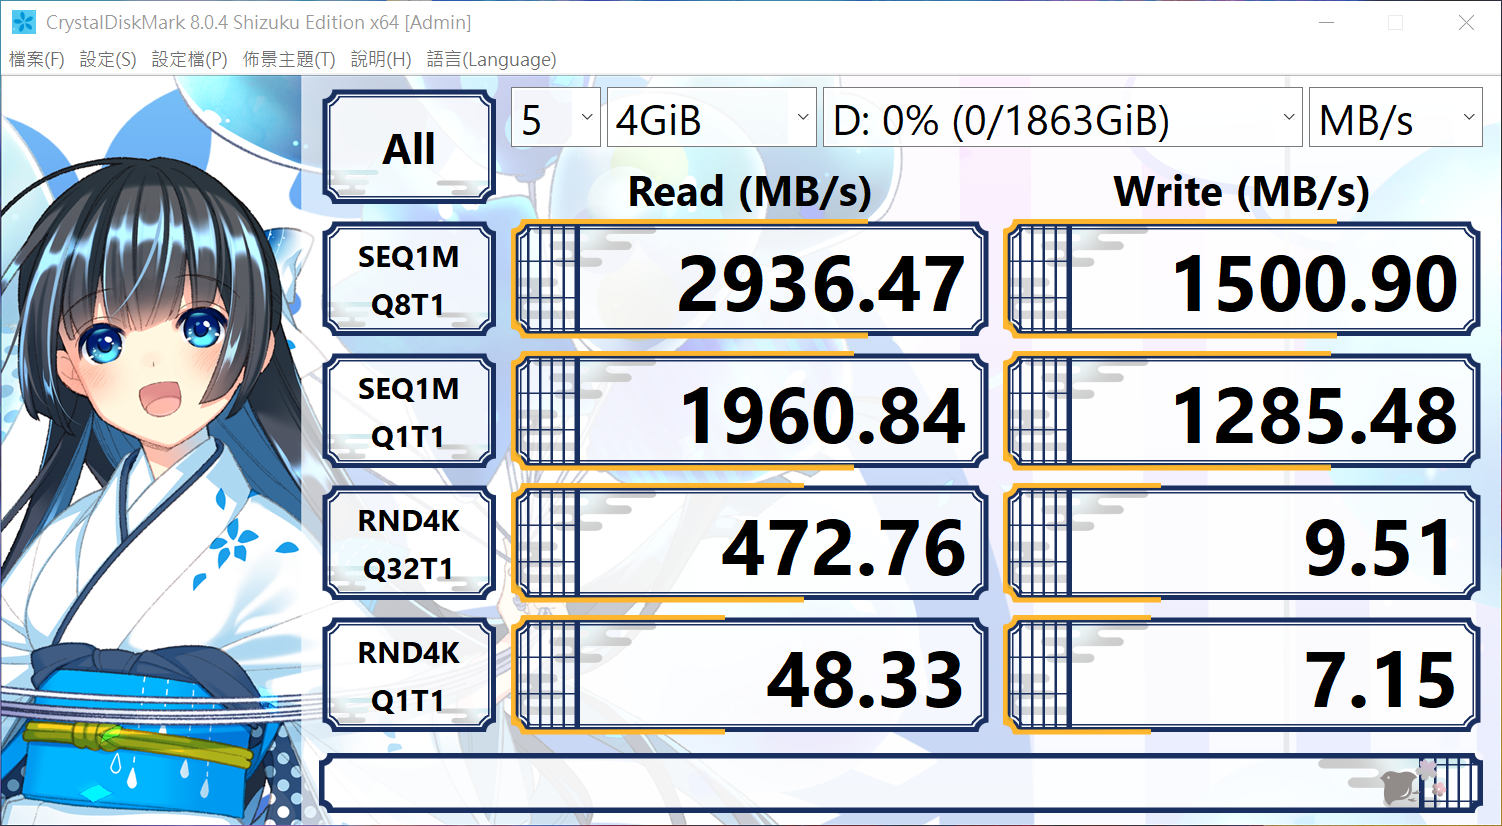 OWC Envoy Pro FX 最強外接高速 SSD!雙協定 Thunderbolt 3 + USB 3.2 Gen 2 速度與相容性皆具 @3C 達人廖阿輝